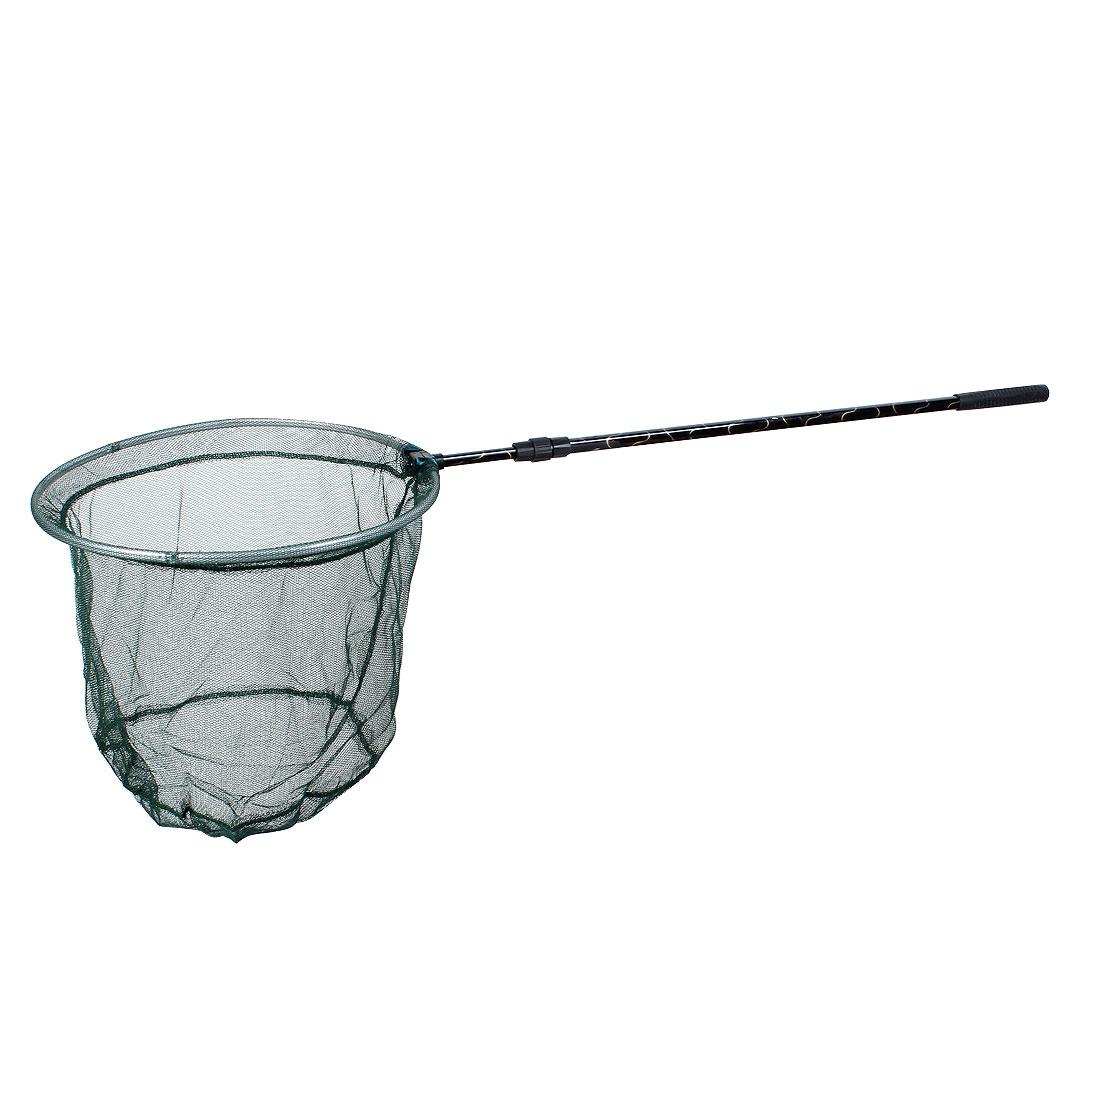 Retractable Metal Handle Folding Fishing Landing Dip Net 121cm 2 Sections